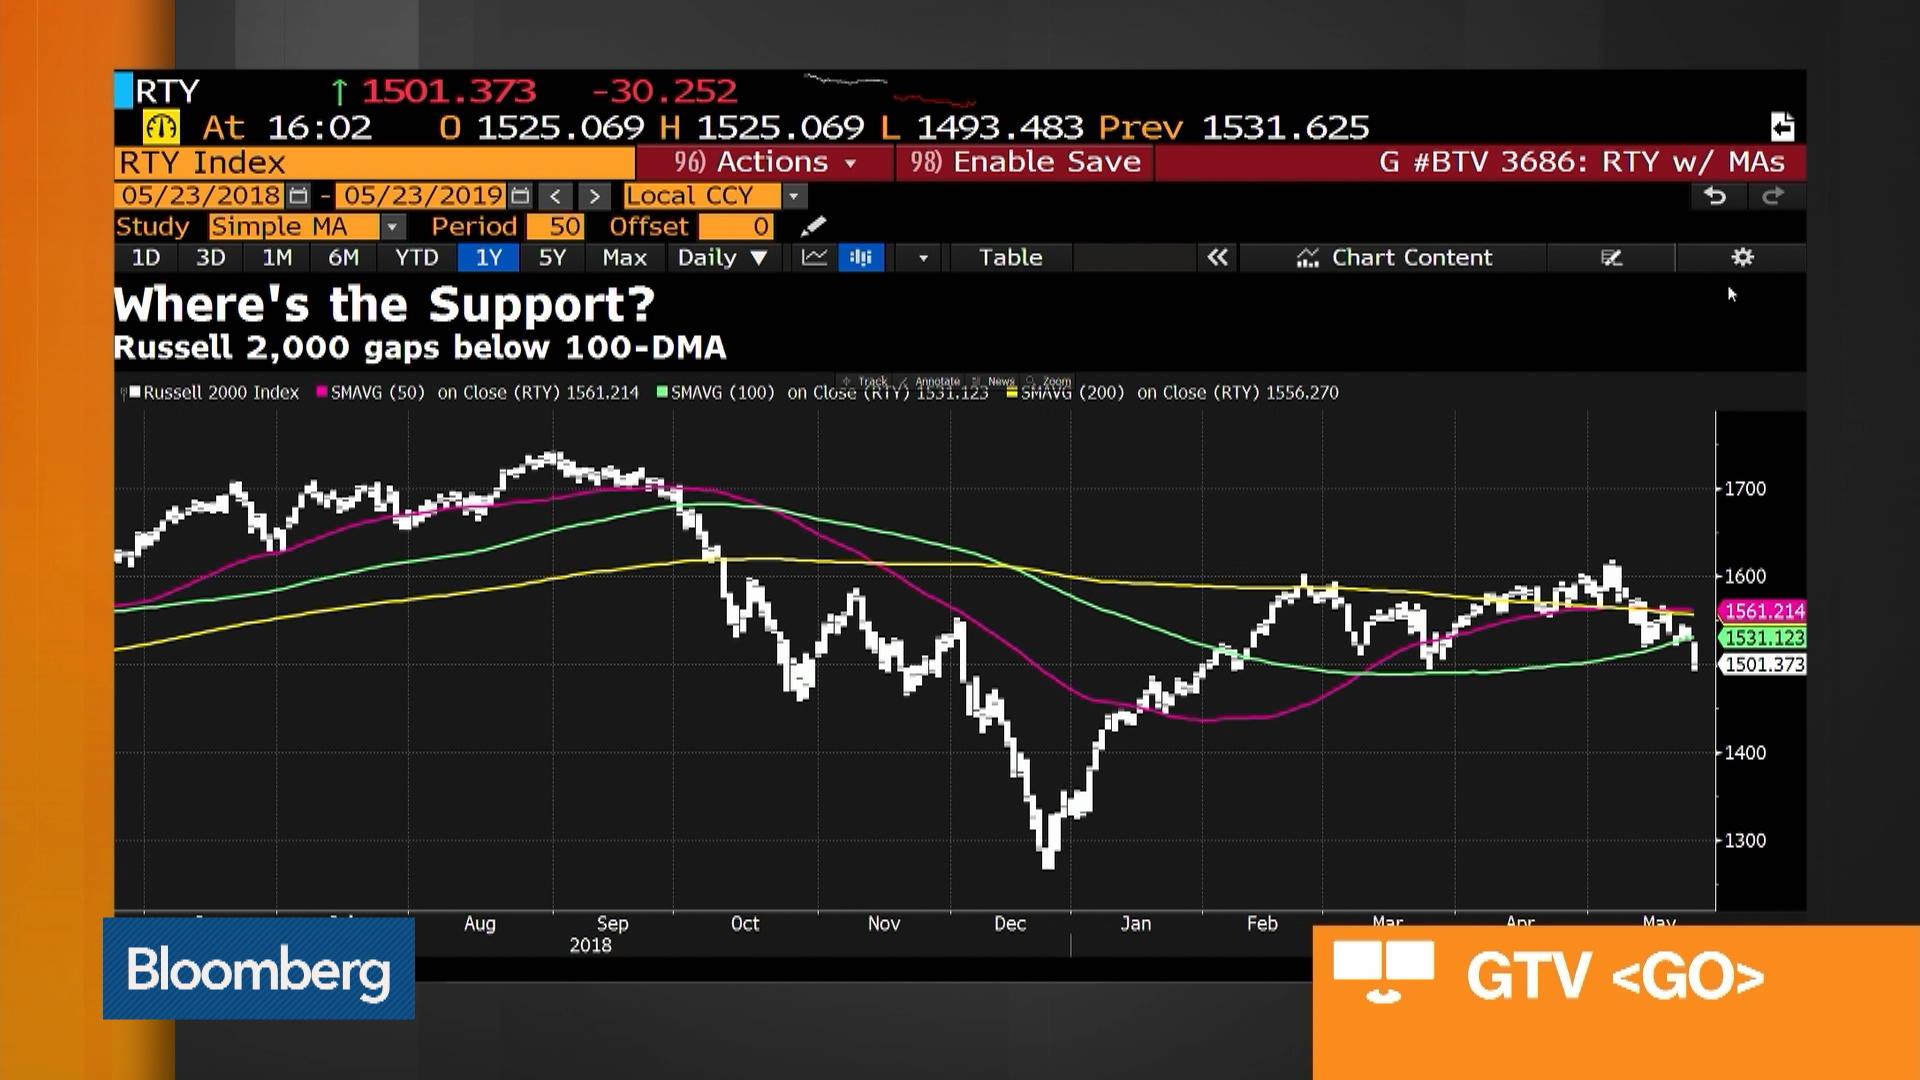 Bloomberg Market Wrap 5/23: S&P 500 Bearish Pattern, Small Caps, Best Buy